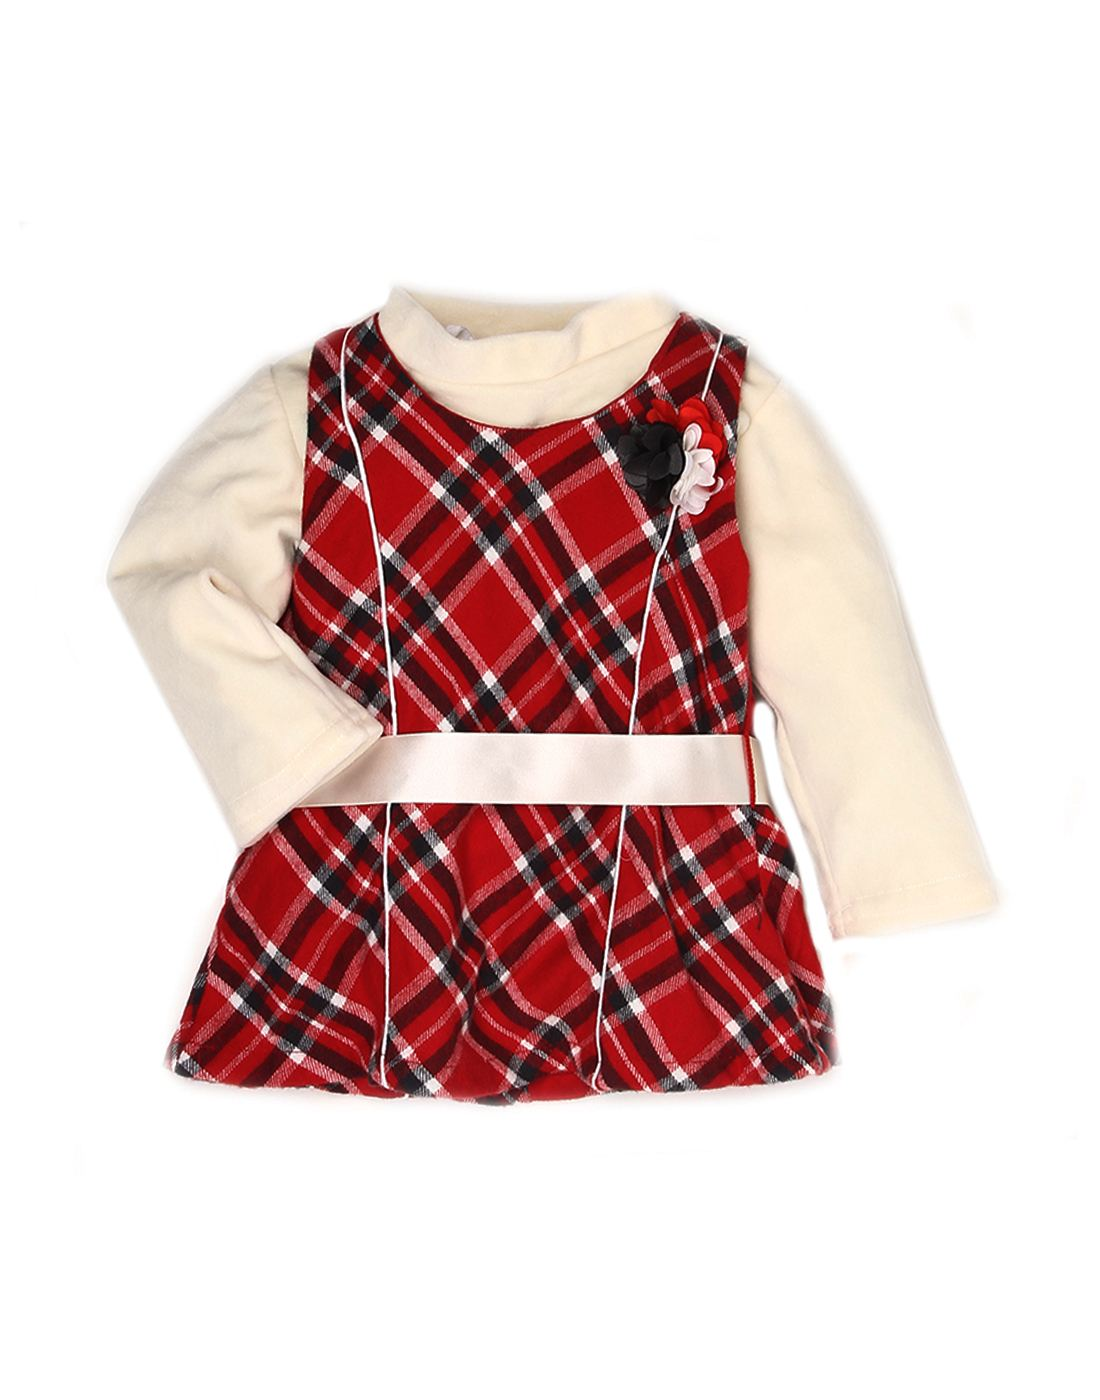 K.C.O 89 Girls Casual Checkered Full Sleeve Dress